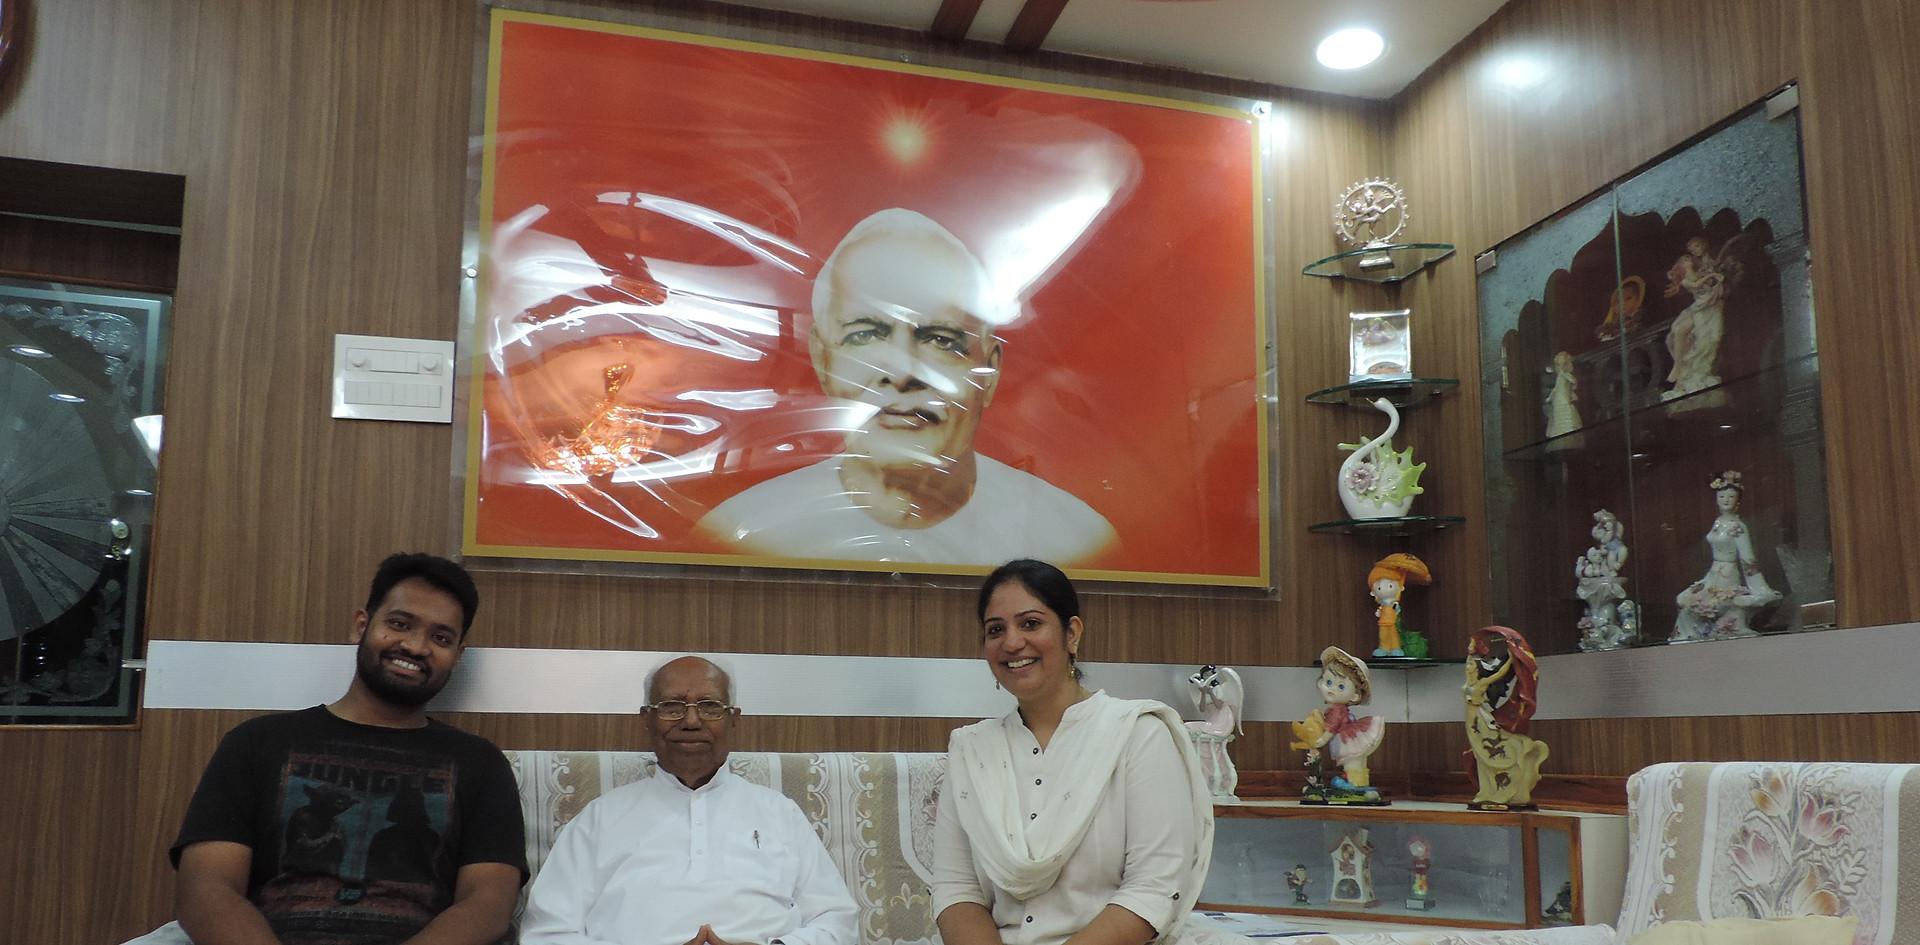 Mr. Daksh Gaur, Founder, Blub World and Mrs. Aditi Gaur, Editor, Blub world with Rajyogi B.K. Karuna Ji, P.R.O. & Chief of Multi Media, Brahma Kumaris